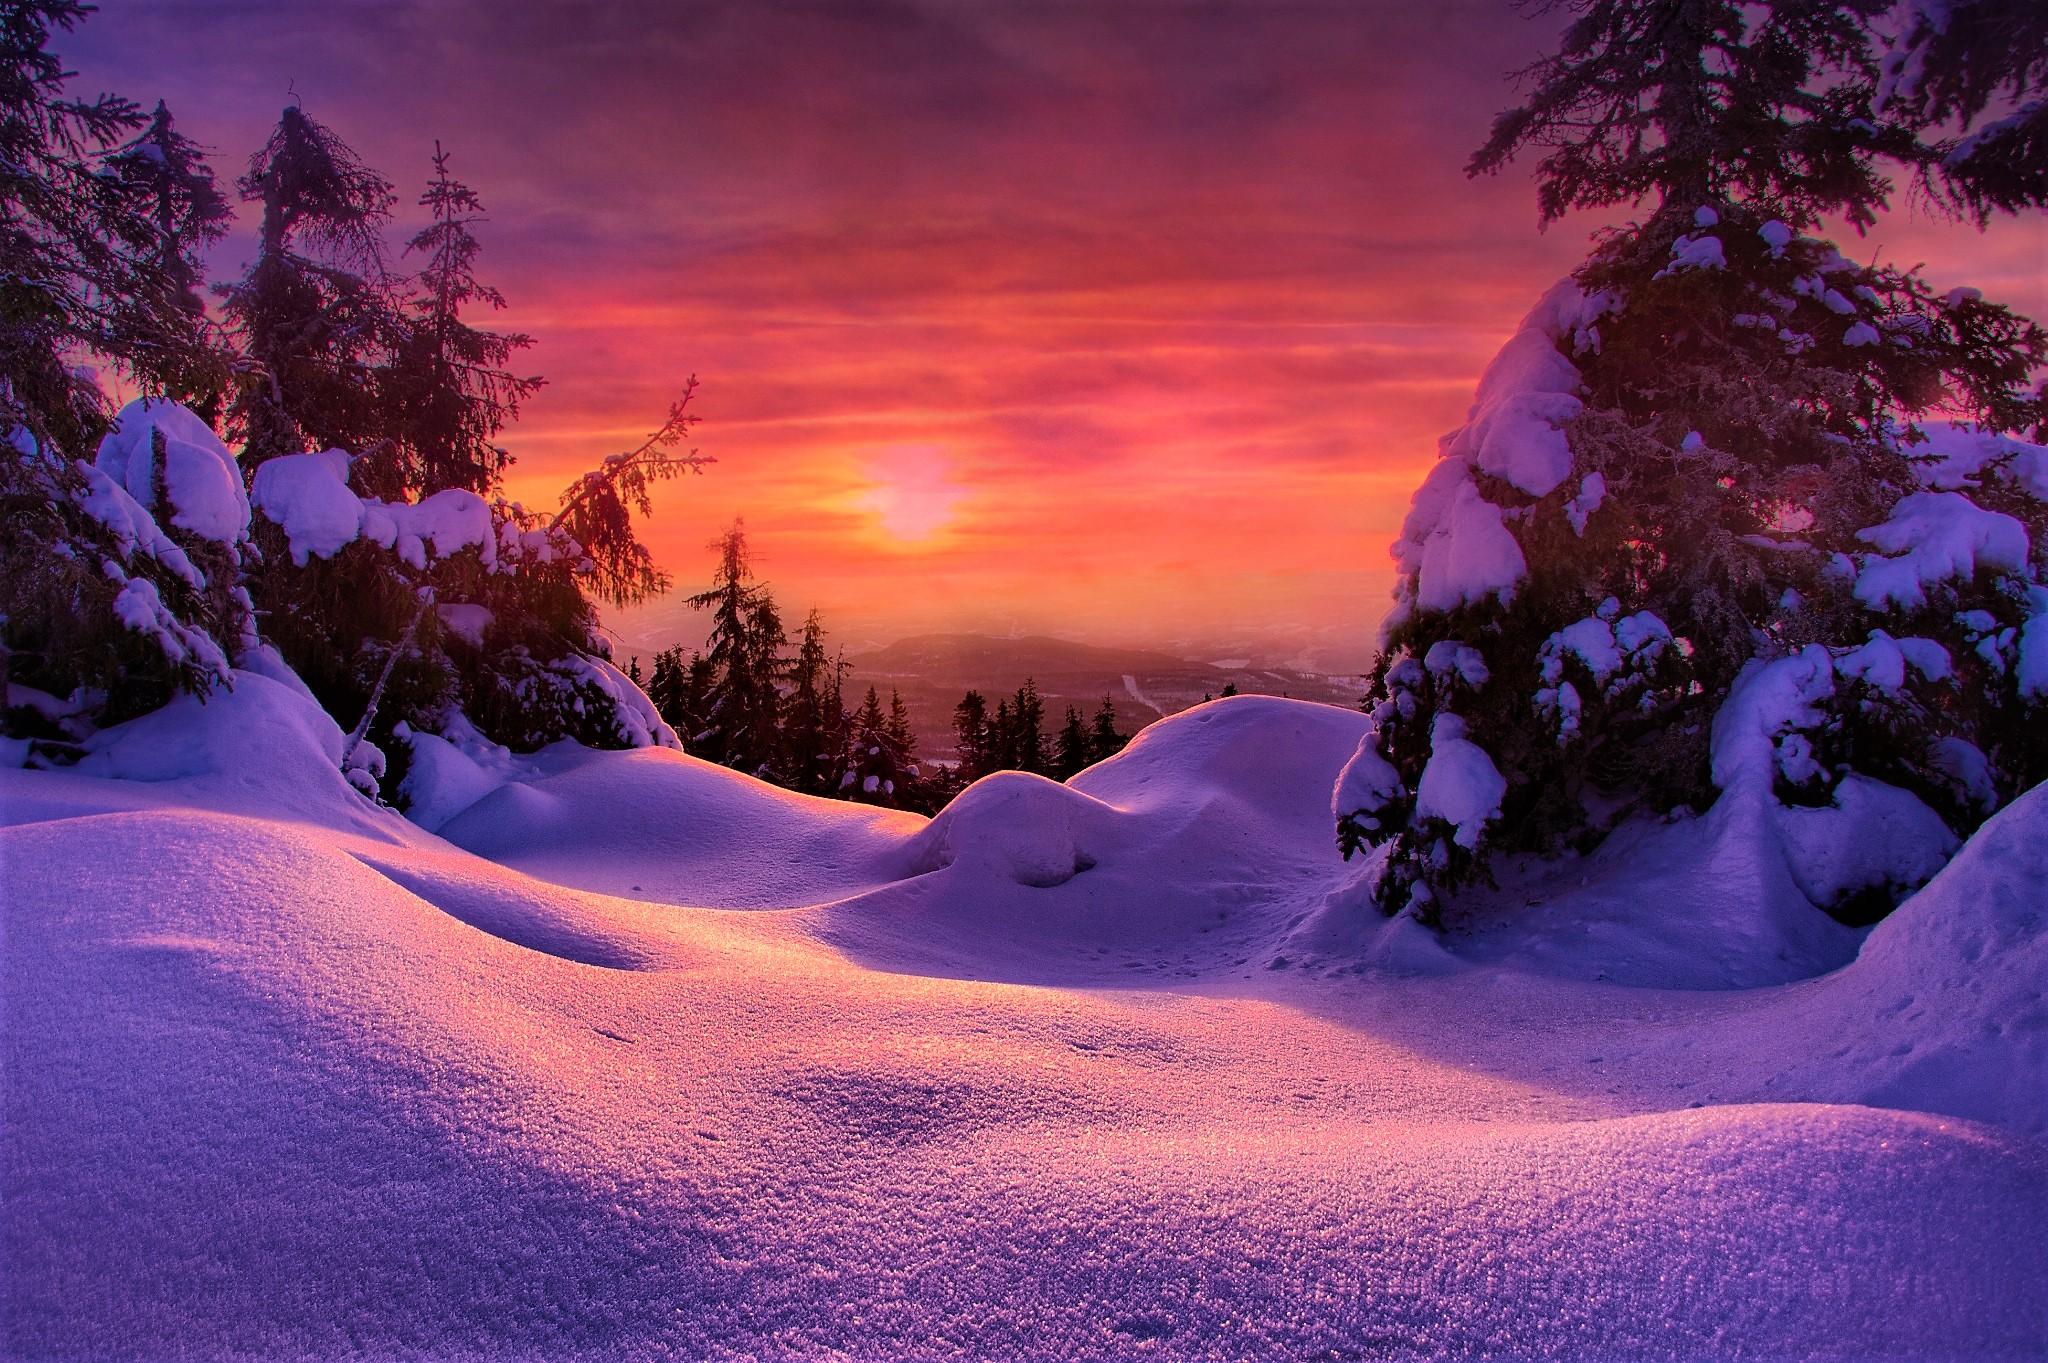 Winter Snow Sky 2048x1363